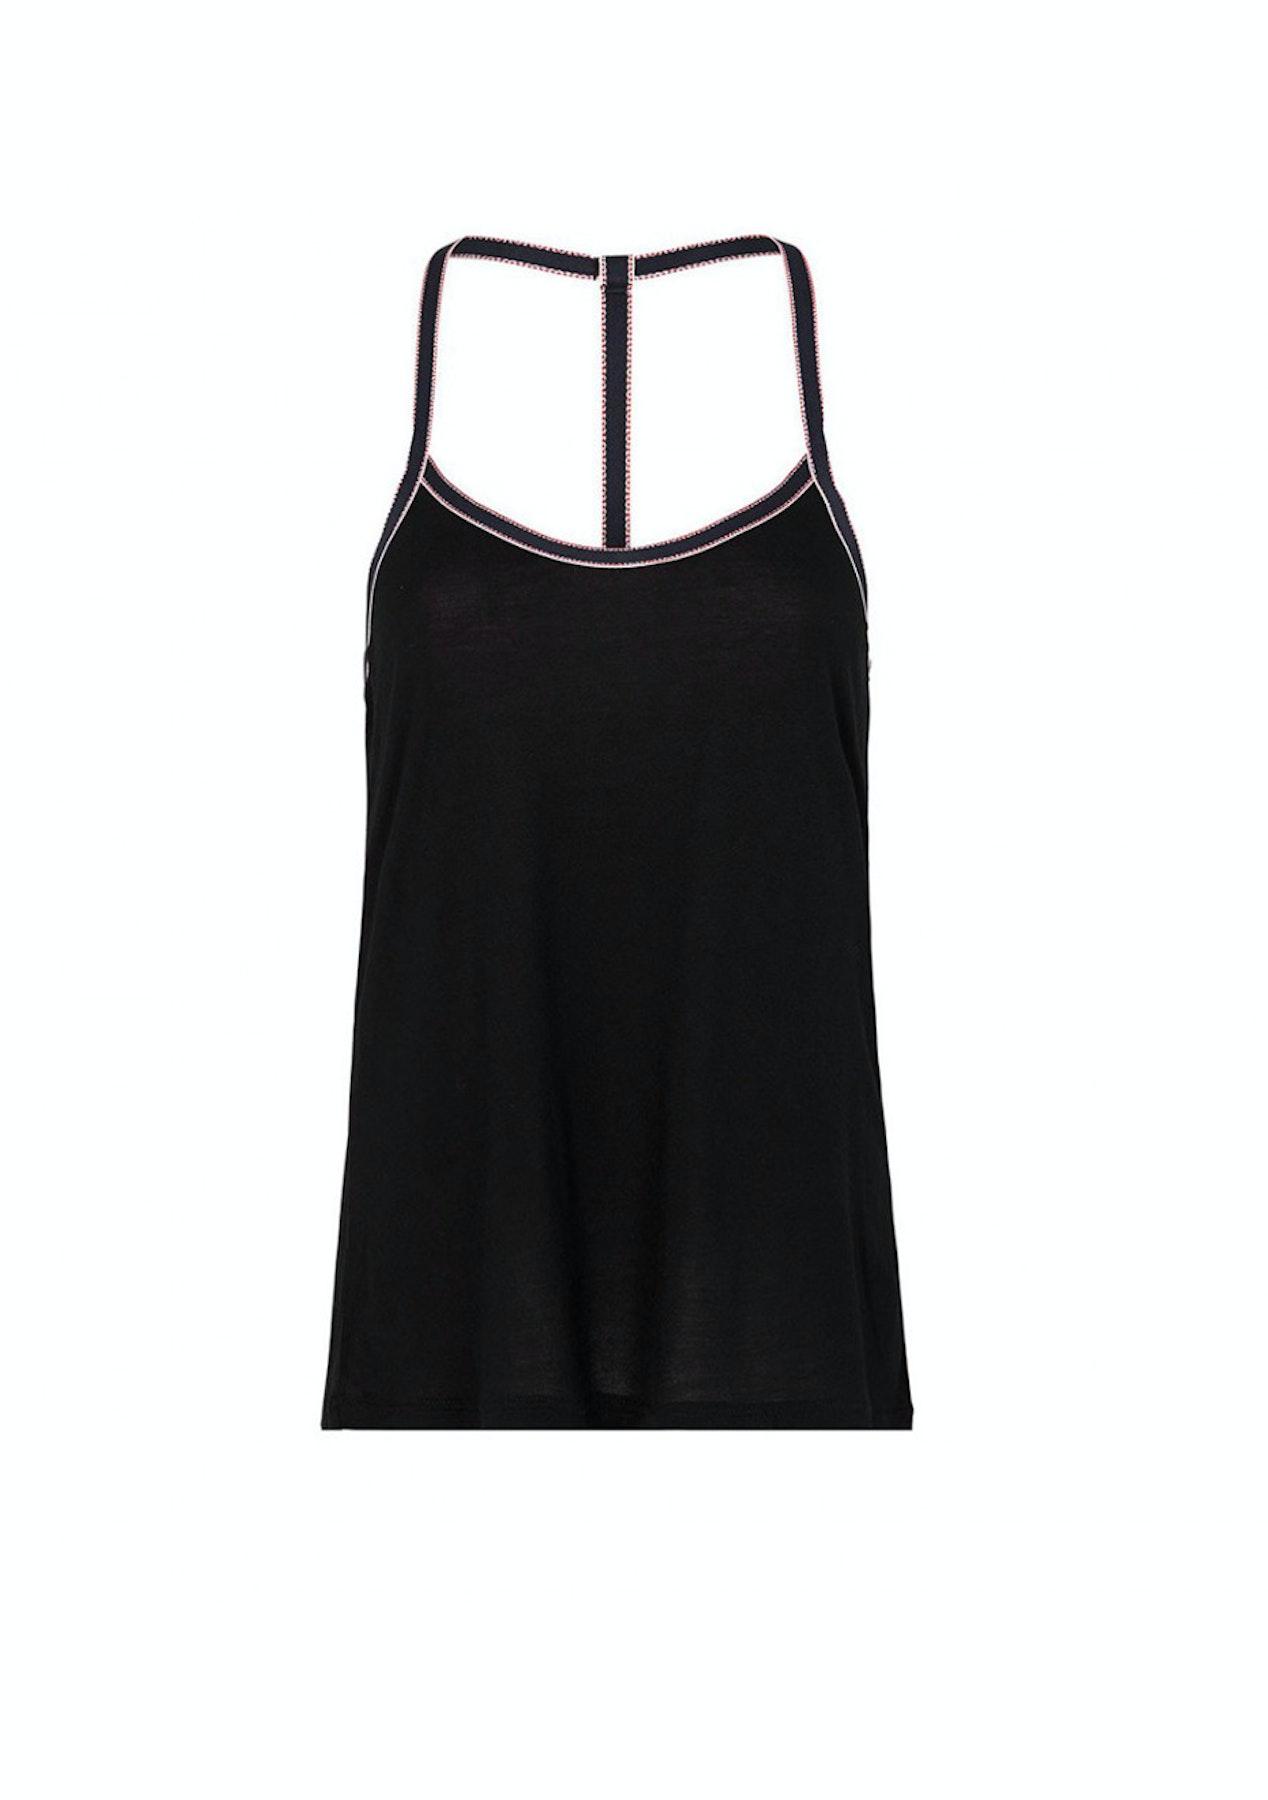 f09a85a7d0f6d Lovable Womens Sleepwear - Nautical Stripes Slvls Top Singlet - Black True  Nv White Rio Red